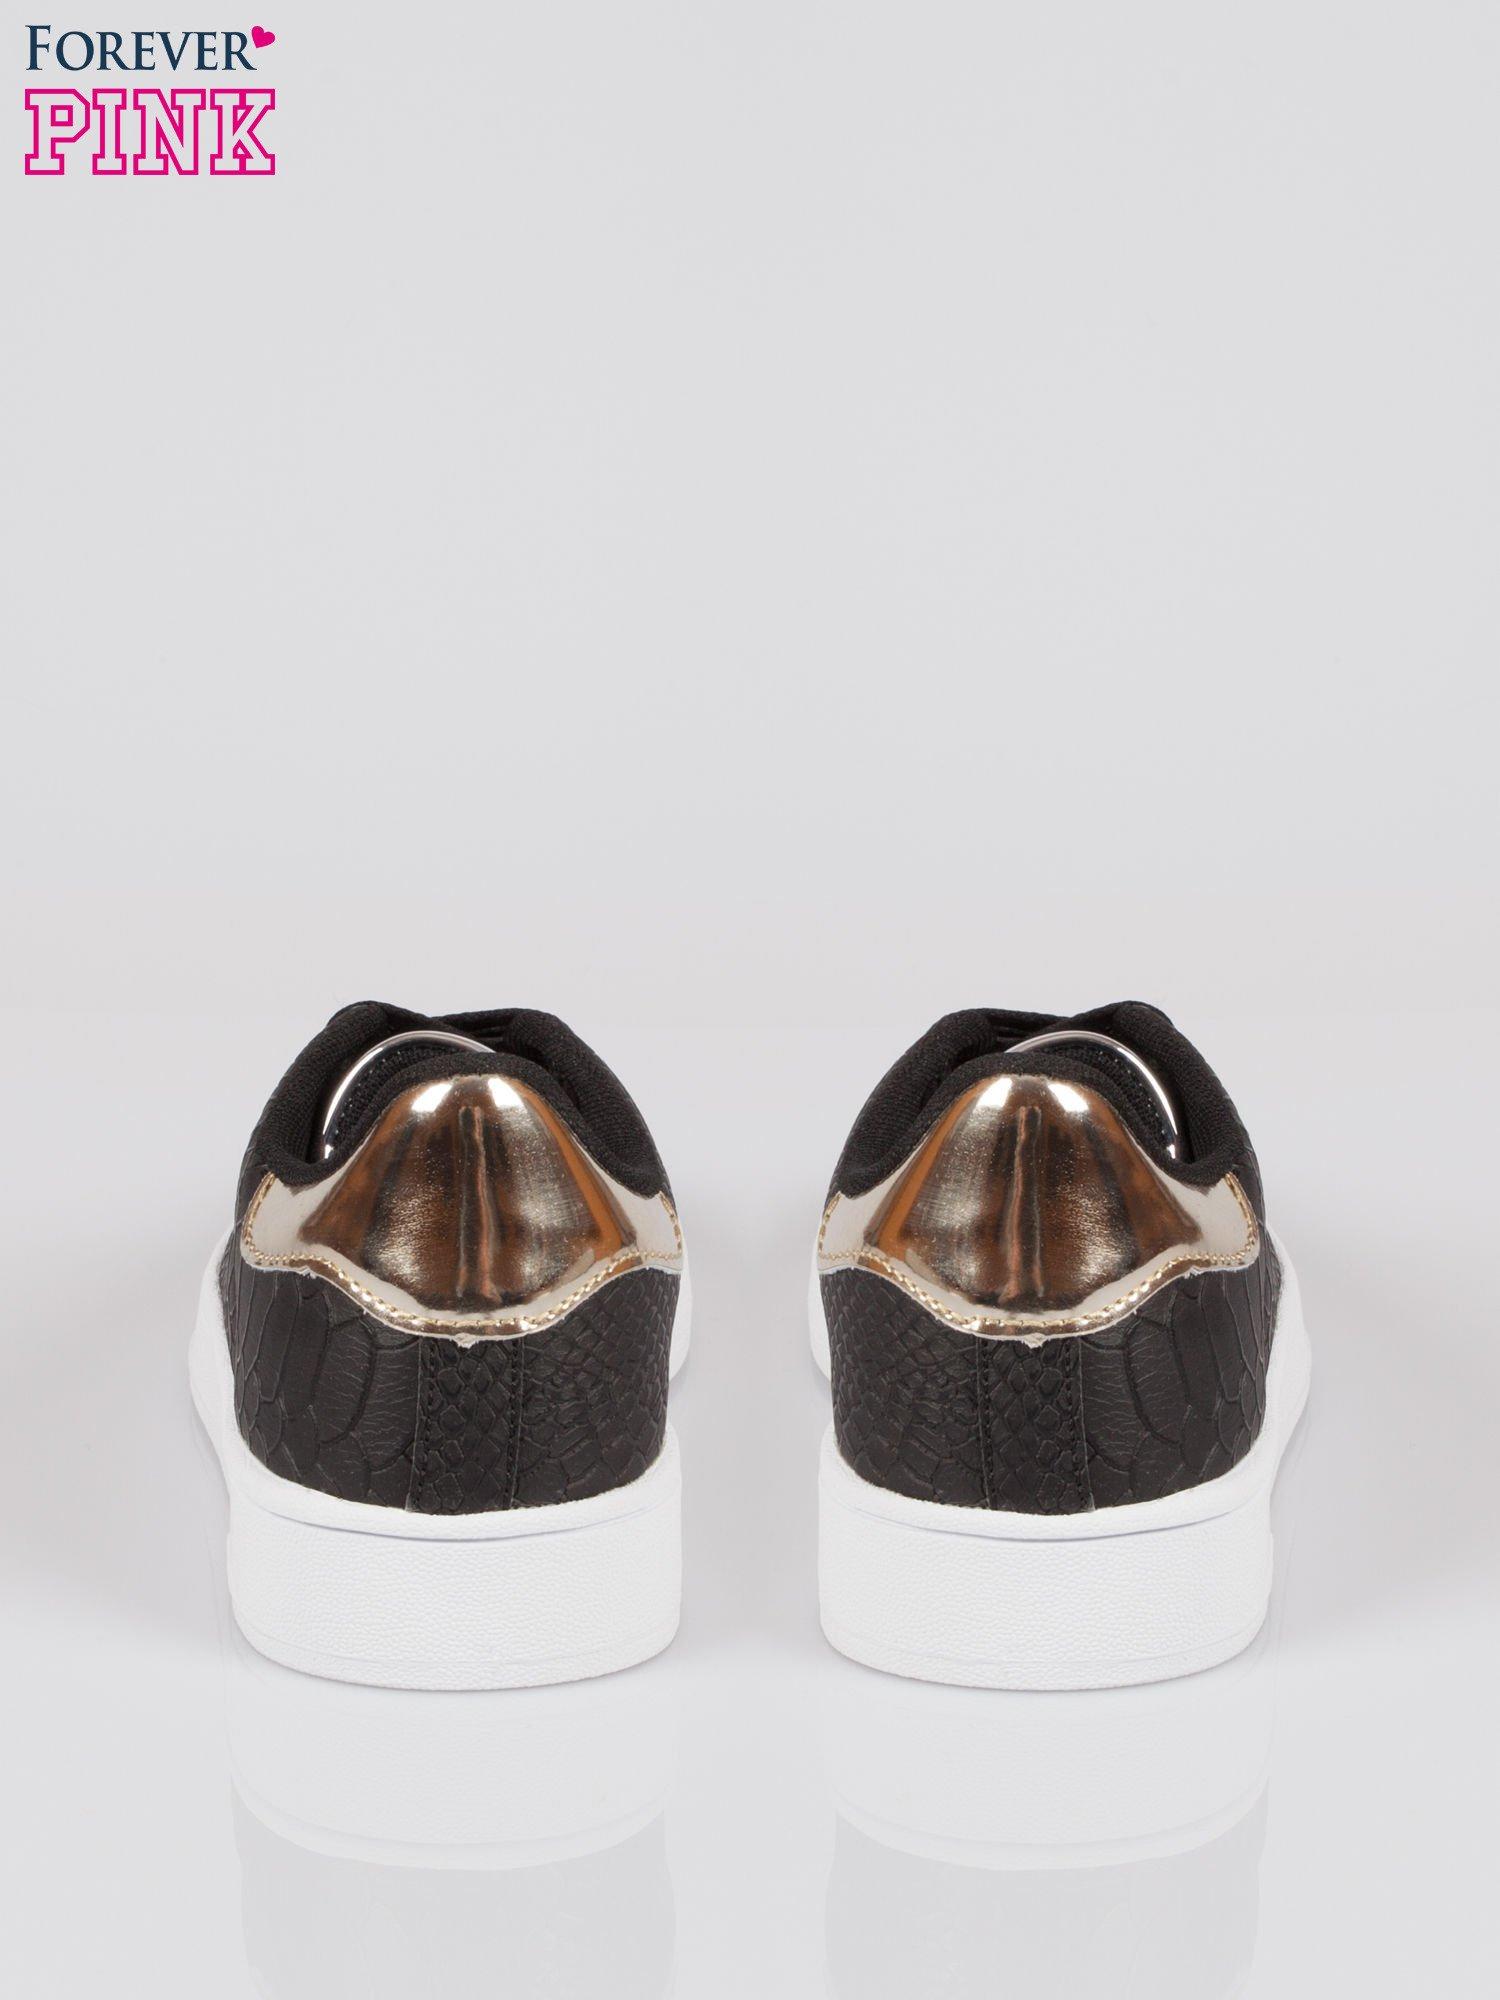 Czarne wężowe buty sportowe gold cap toe                                  zdj.                                  3